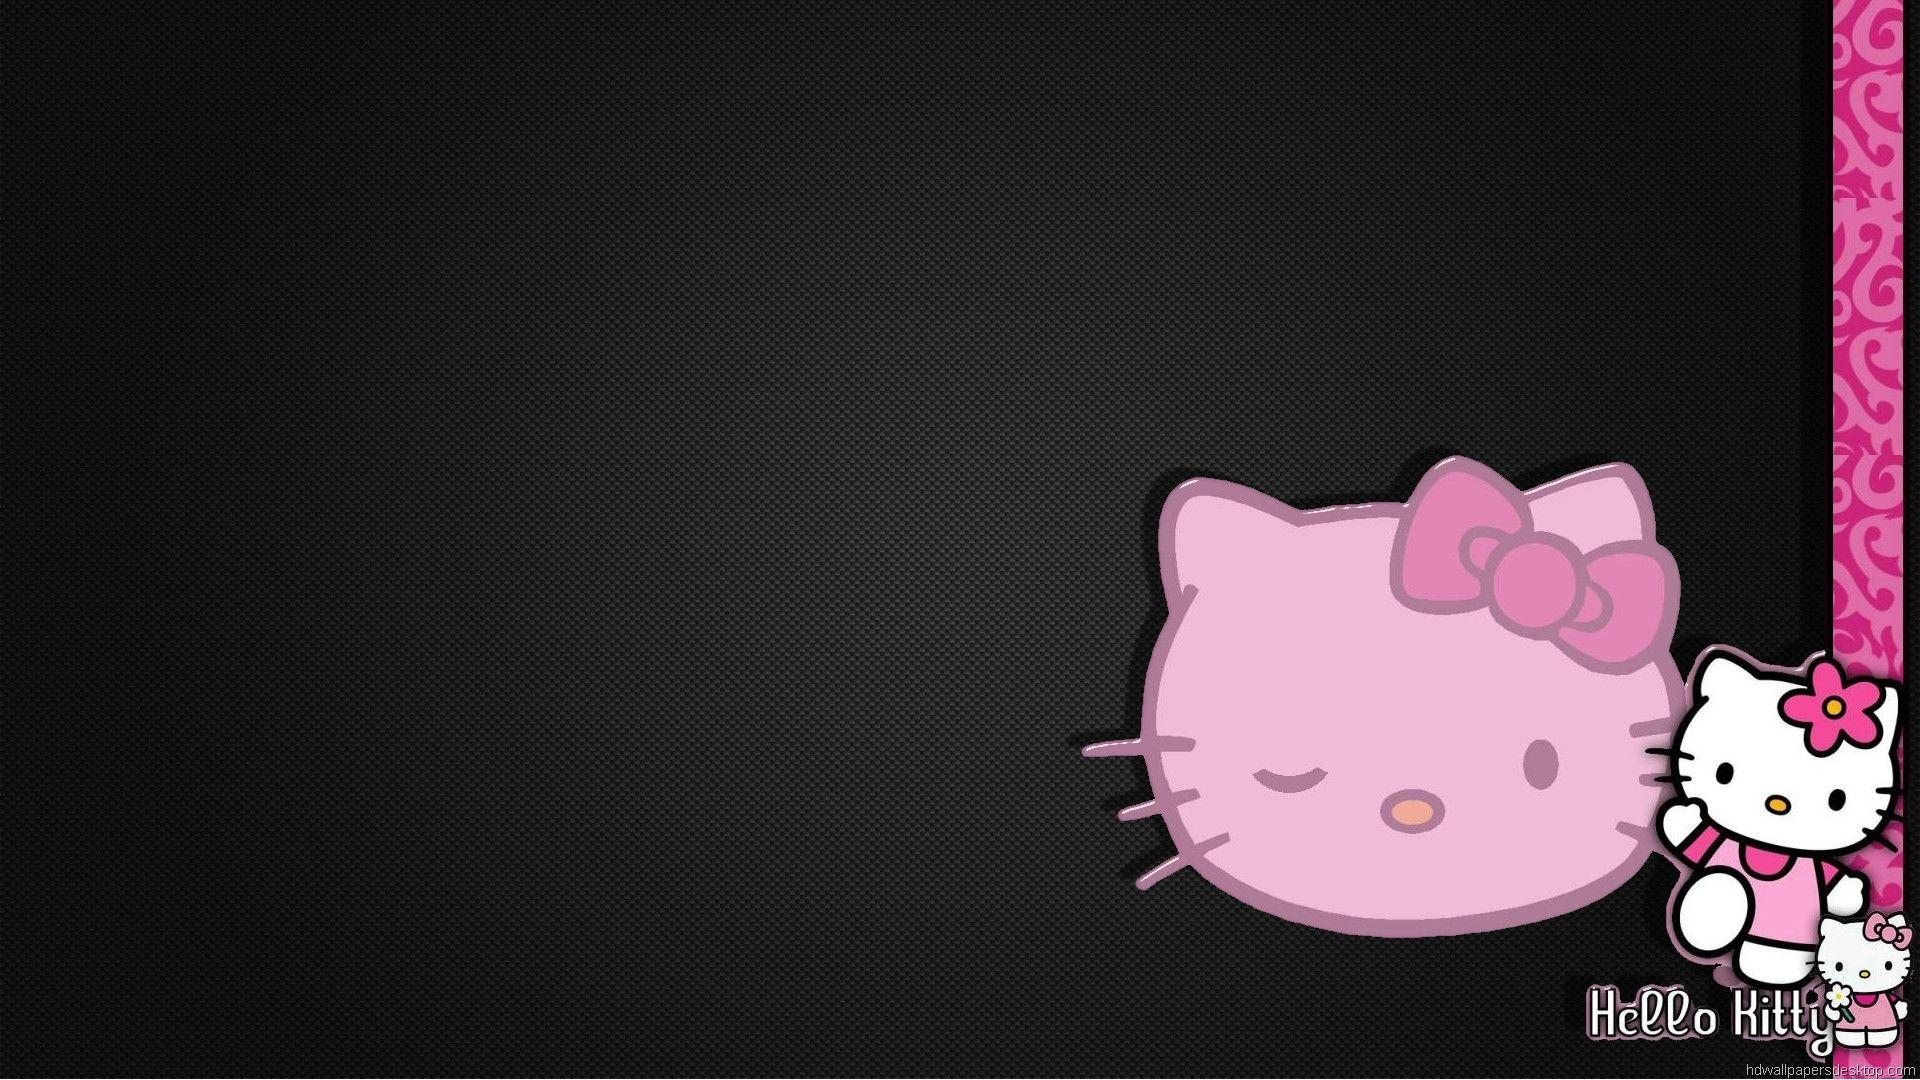 Black-And-Pink-Hd-wallpaper-wp3403269